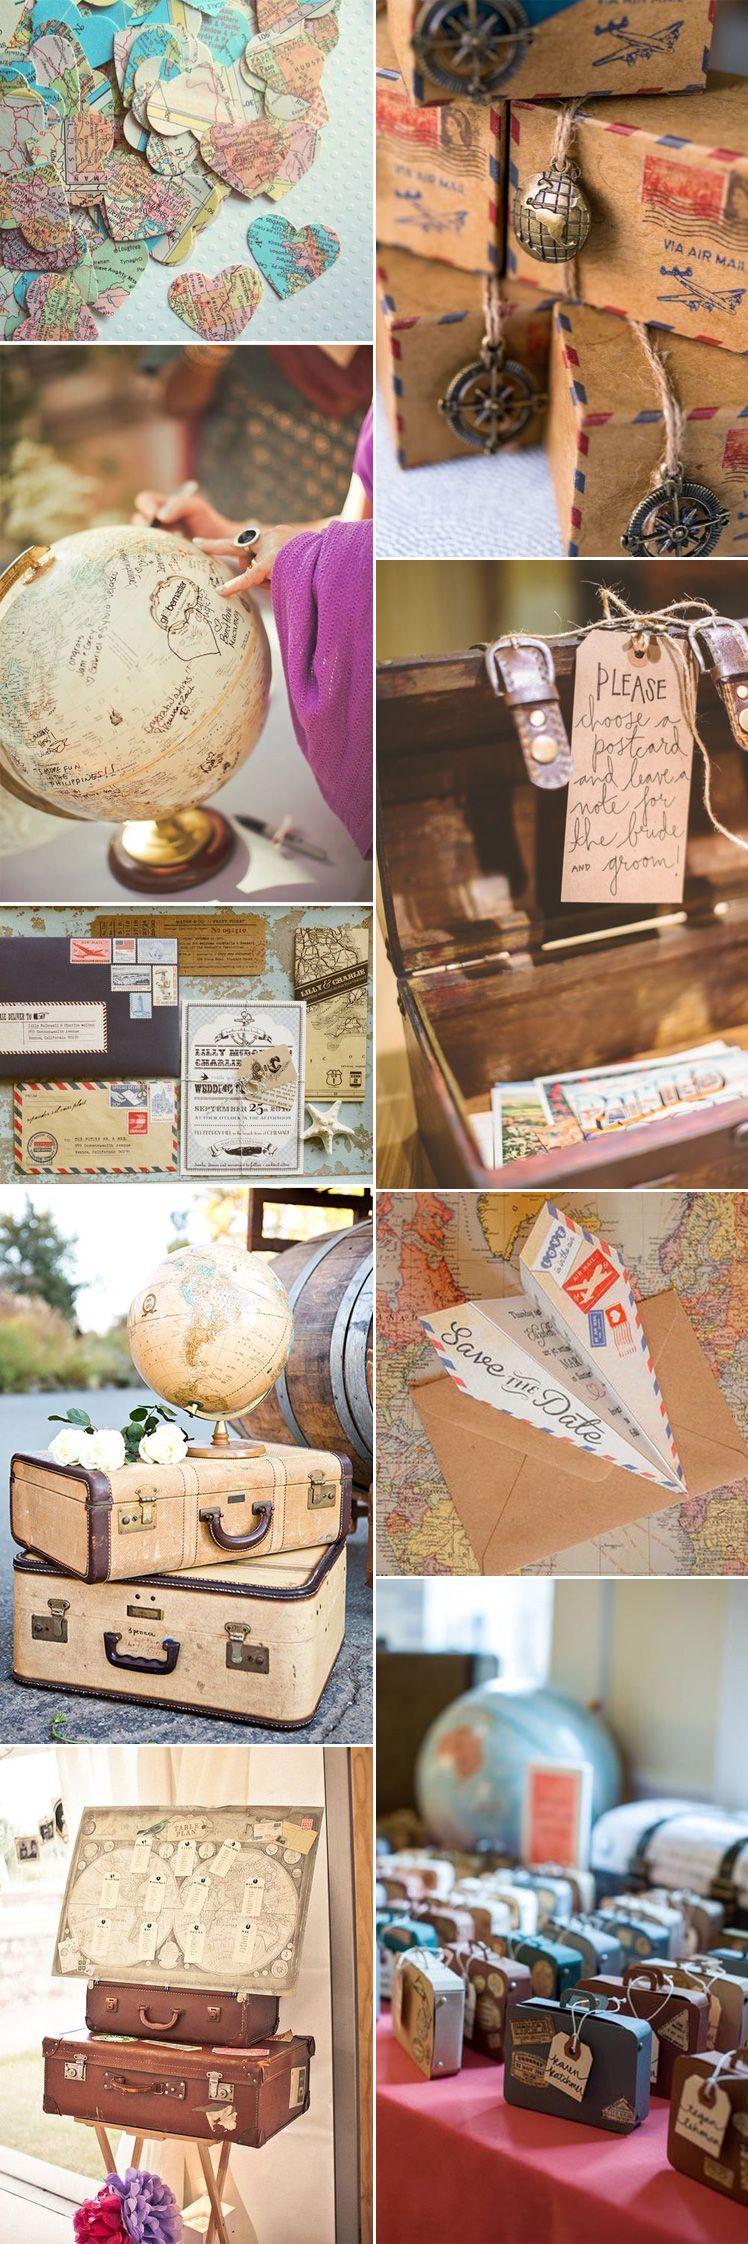 vintage travel wedding theme ideas | mariages, deco mariage et